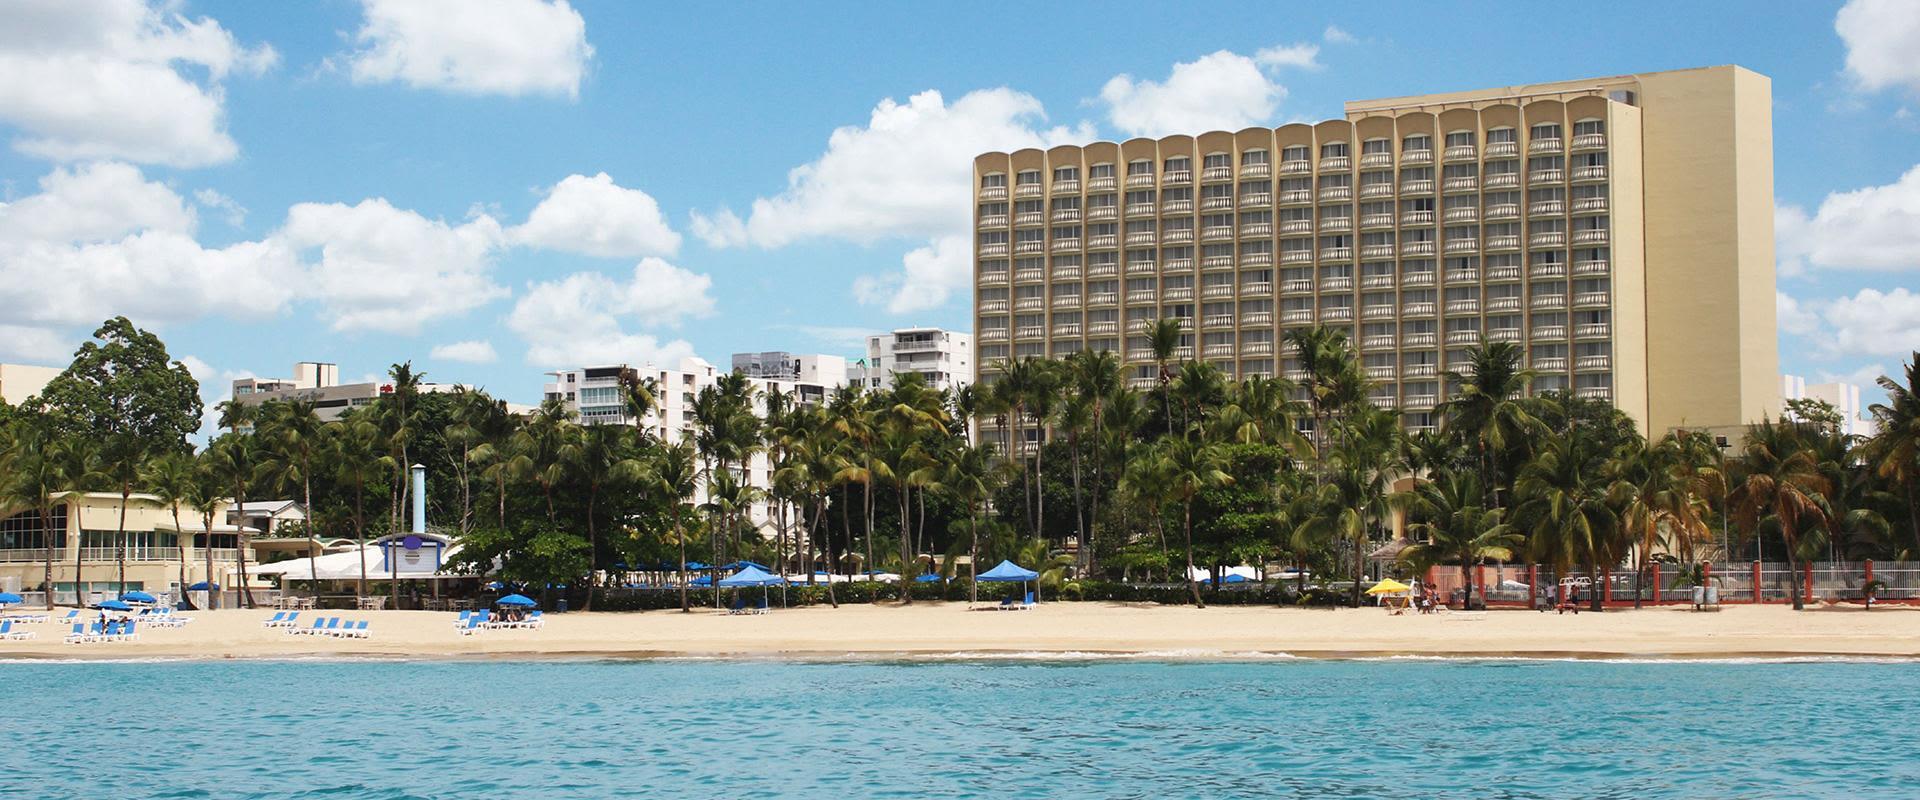 Puerto Rico Beachfront Resort Exterior